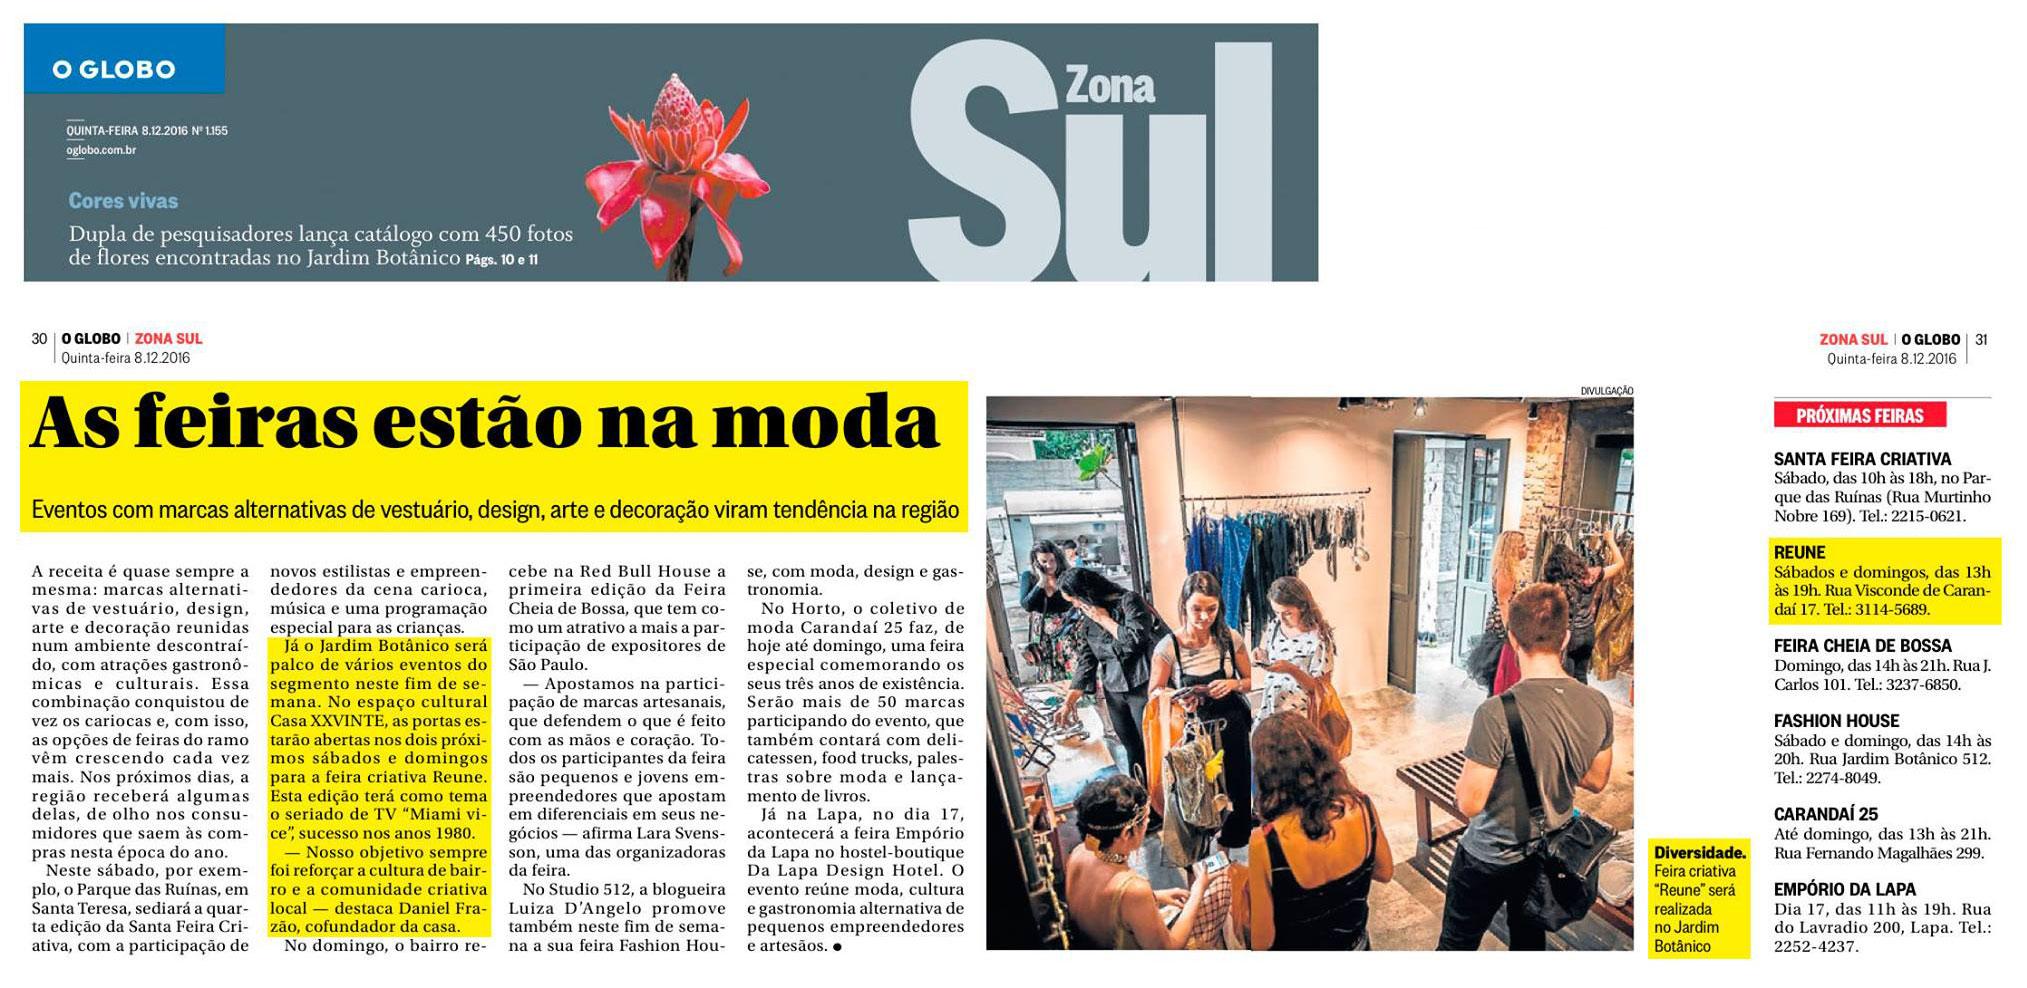 xxvinte coworking O Globo Zona Sul